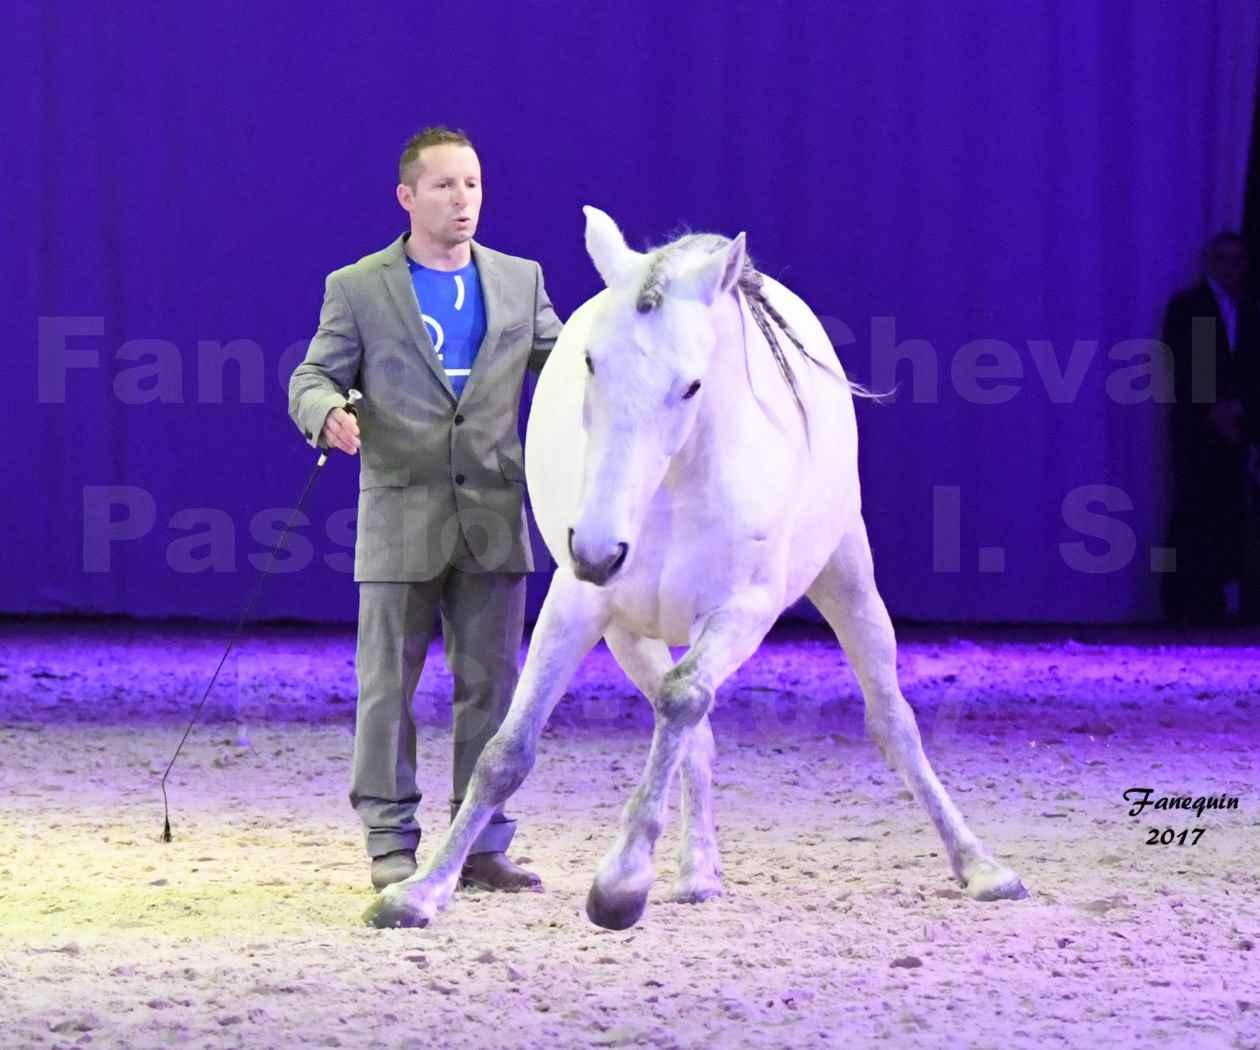 Cheval Passion 2017 - M. I. S. E. C. - Ludovic LONGO & 1 cheval en liberté - 06